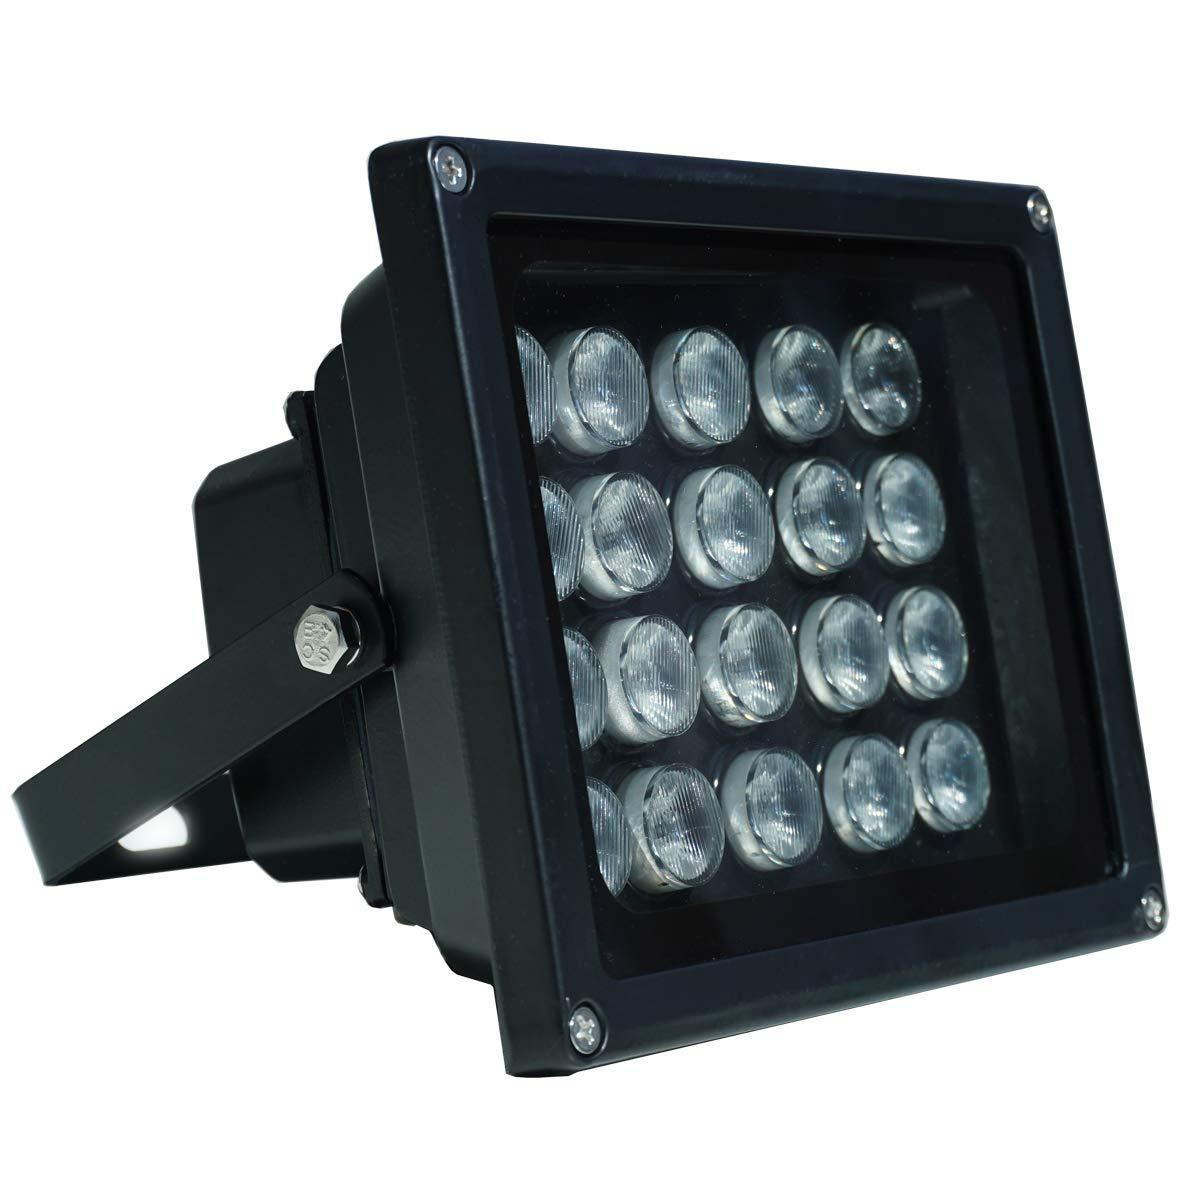 JC Infrared Illuminator 6Led High Power Wide Angle IR Illuminator for 850nm IP Camera CCTV Security Camera